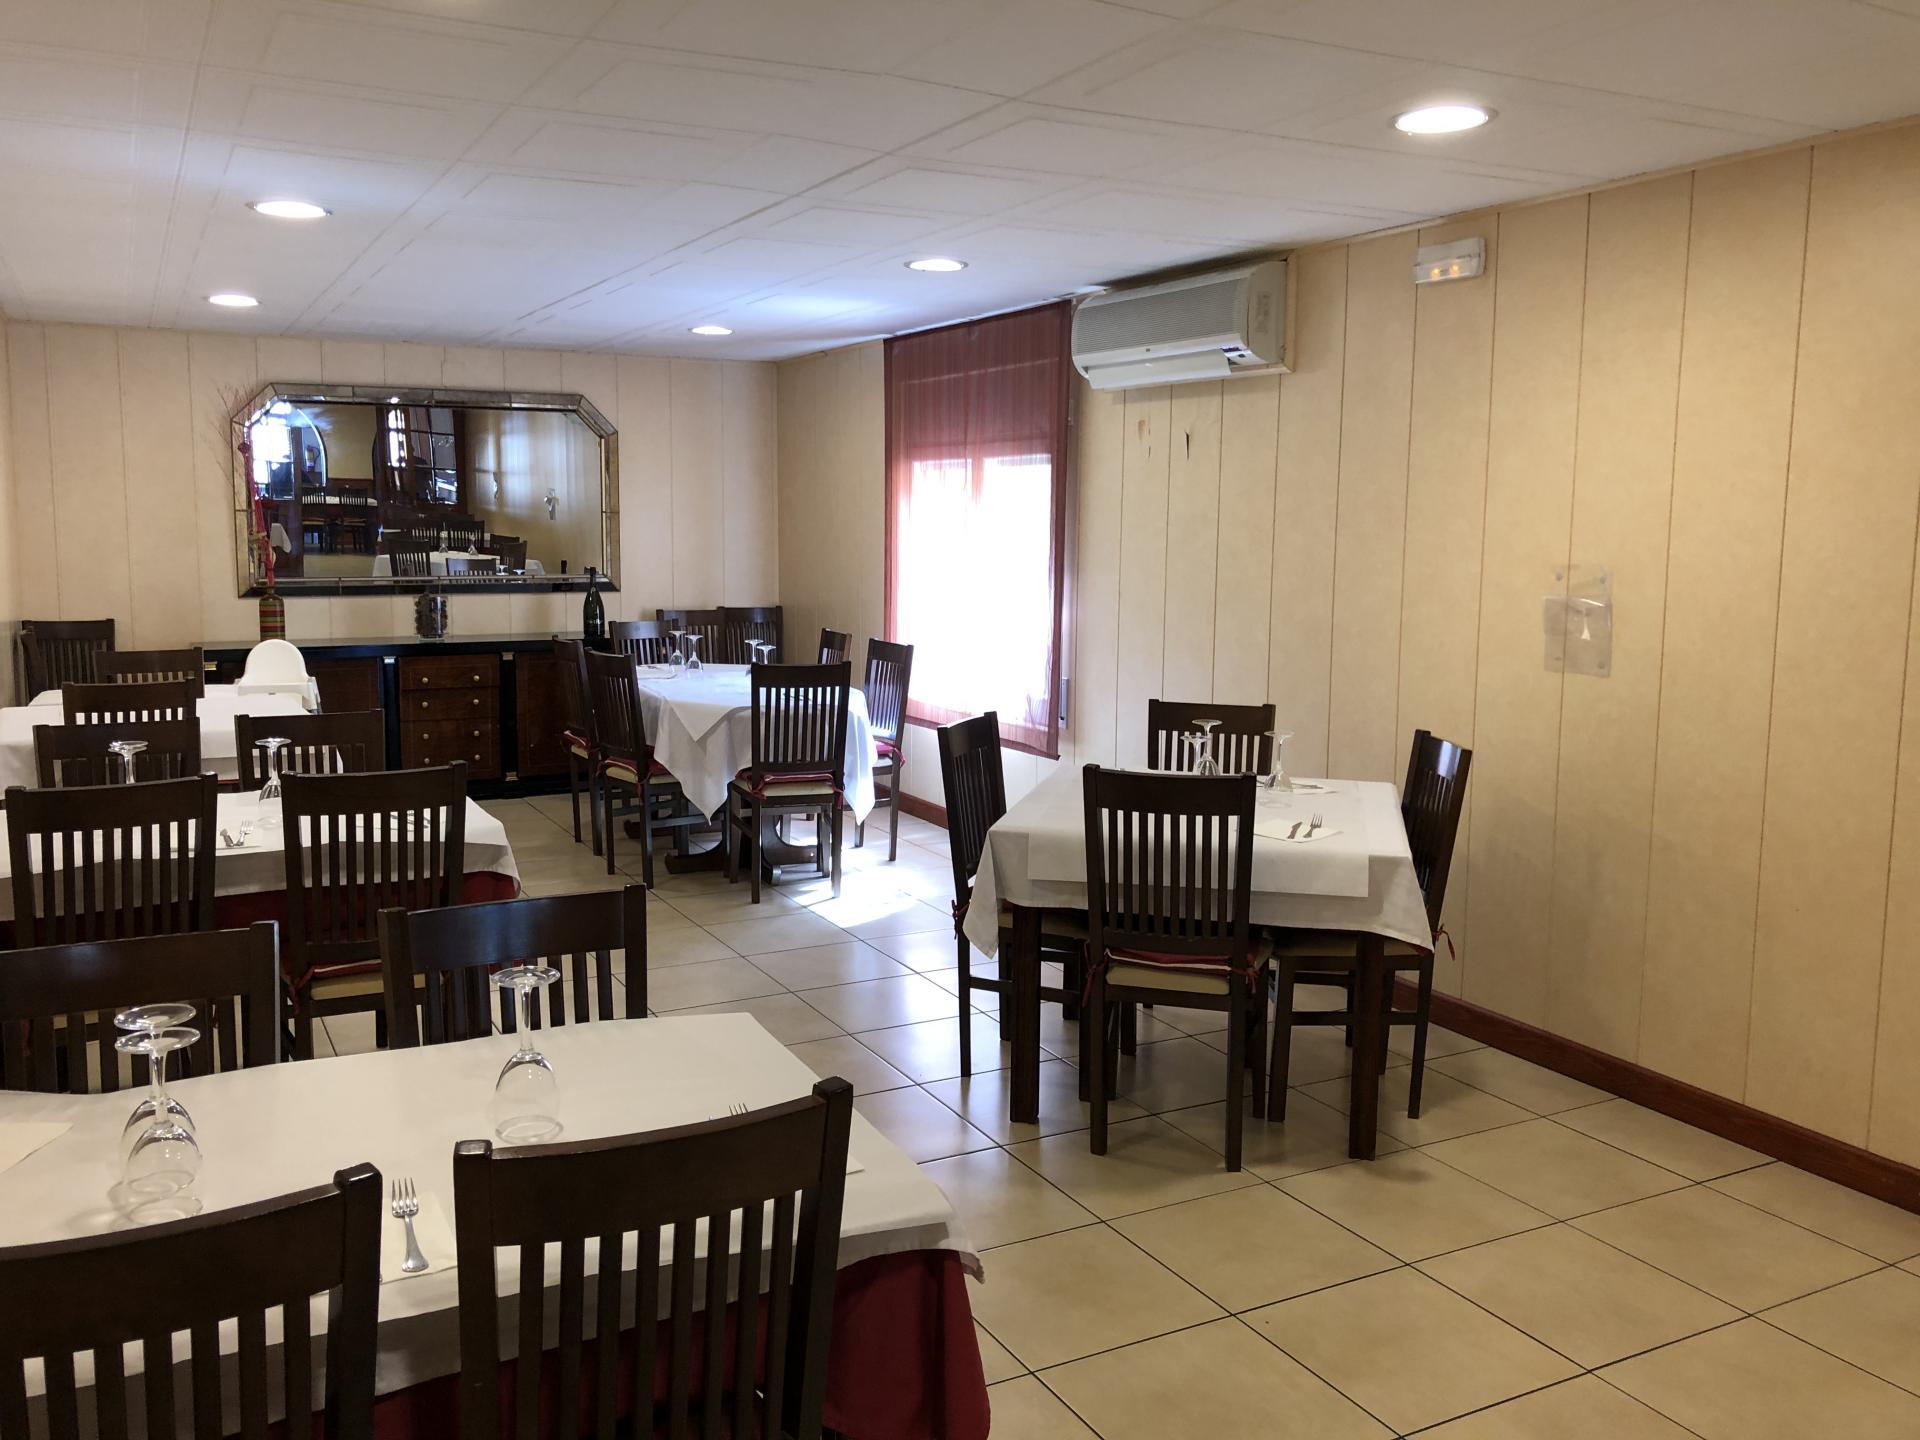 Foto 24 (V-735-2021) - Inmueble en  Venda a Santa Margarida i els Monjos